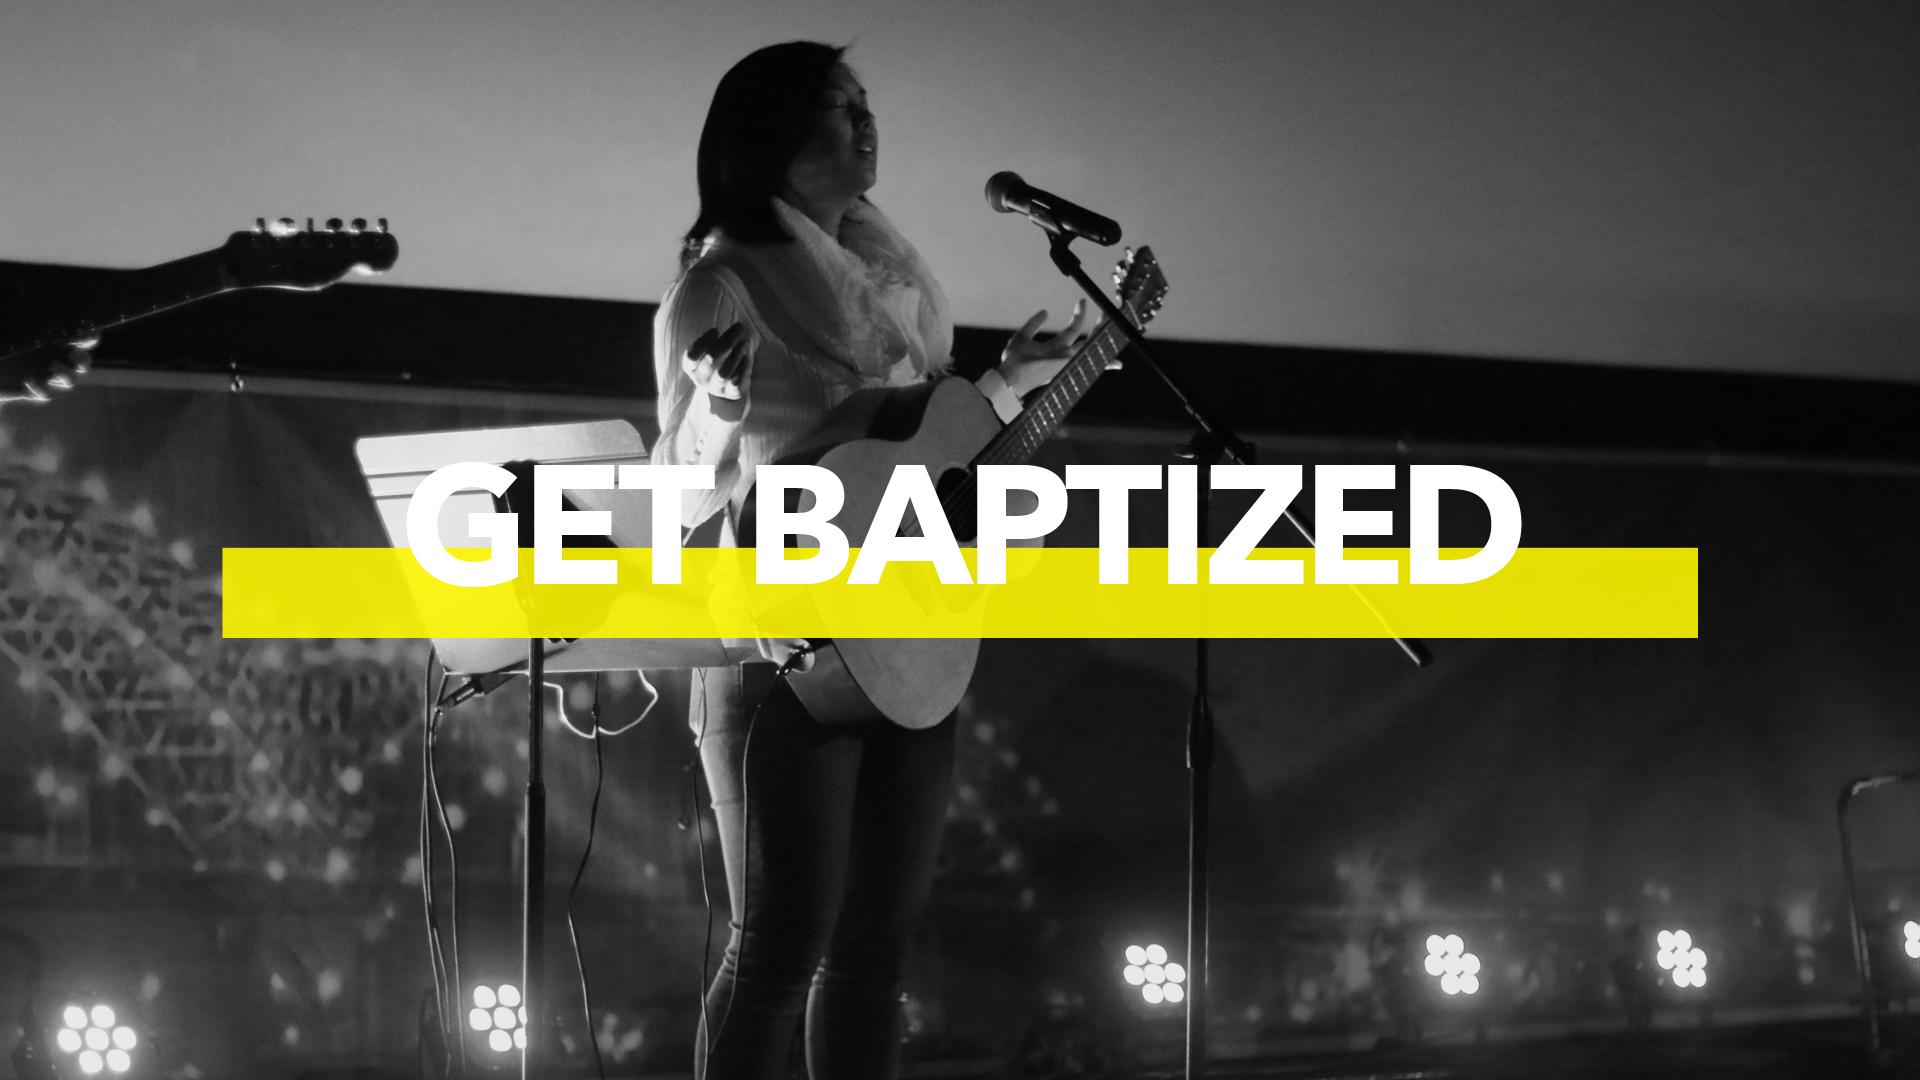 image_BAPTISM.jpg